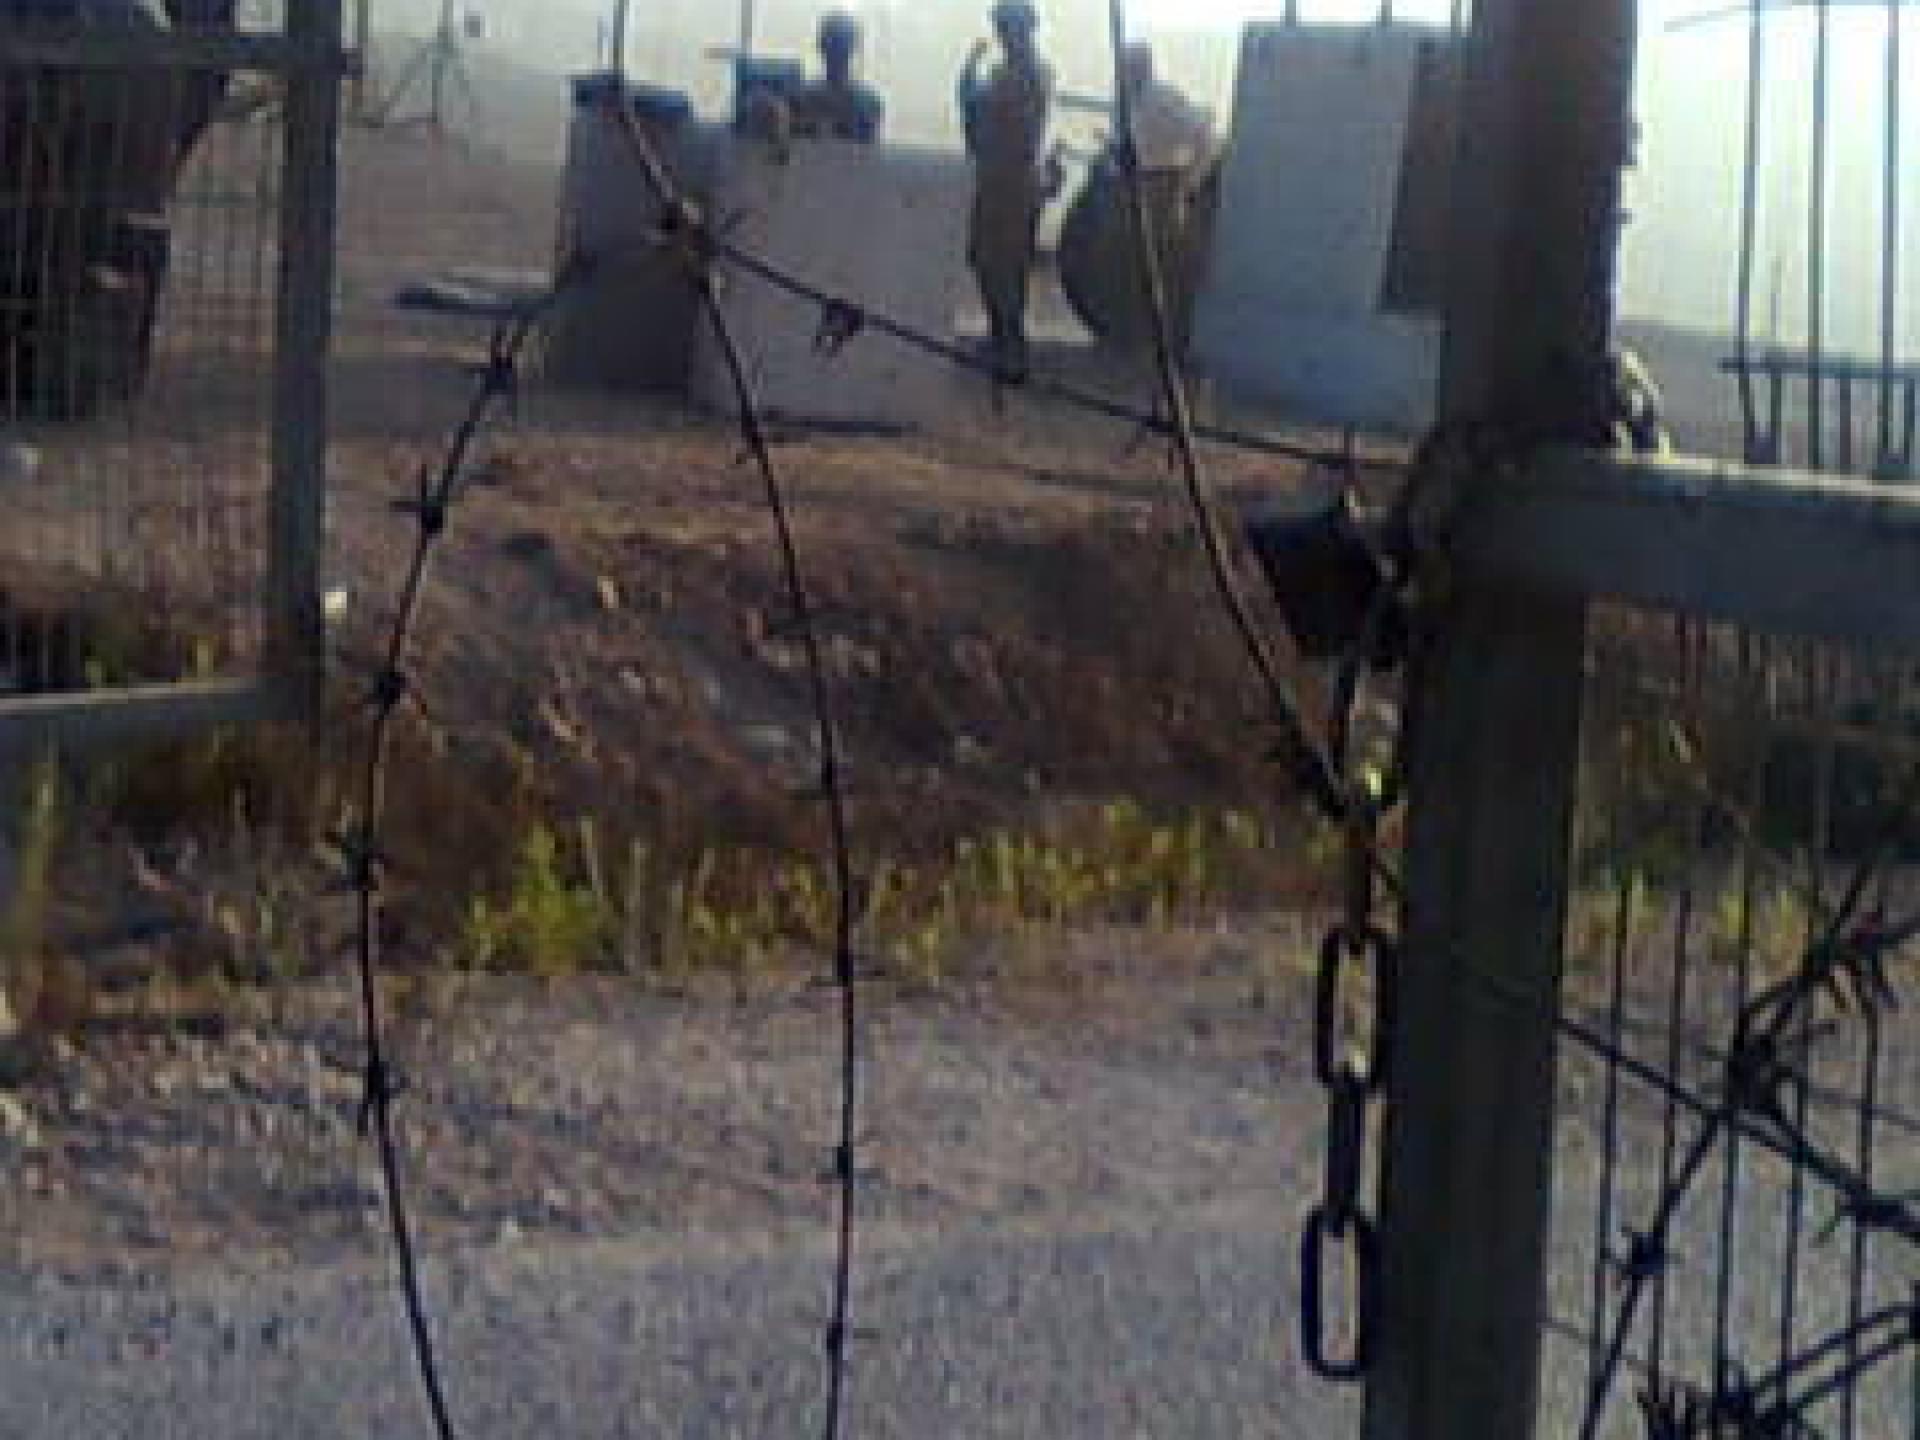 Ba'rta'a/Reikhan checkpoint 22.07.10